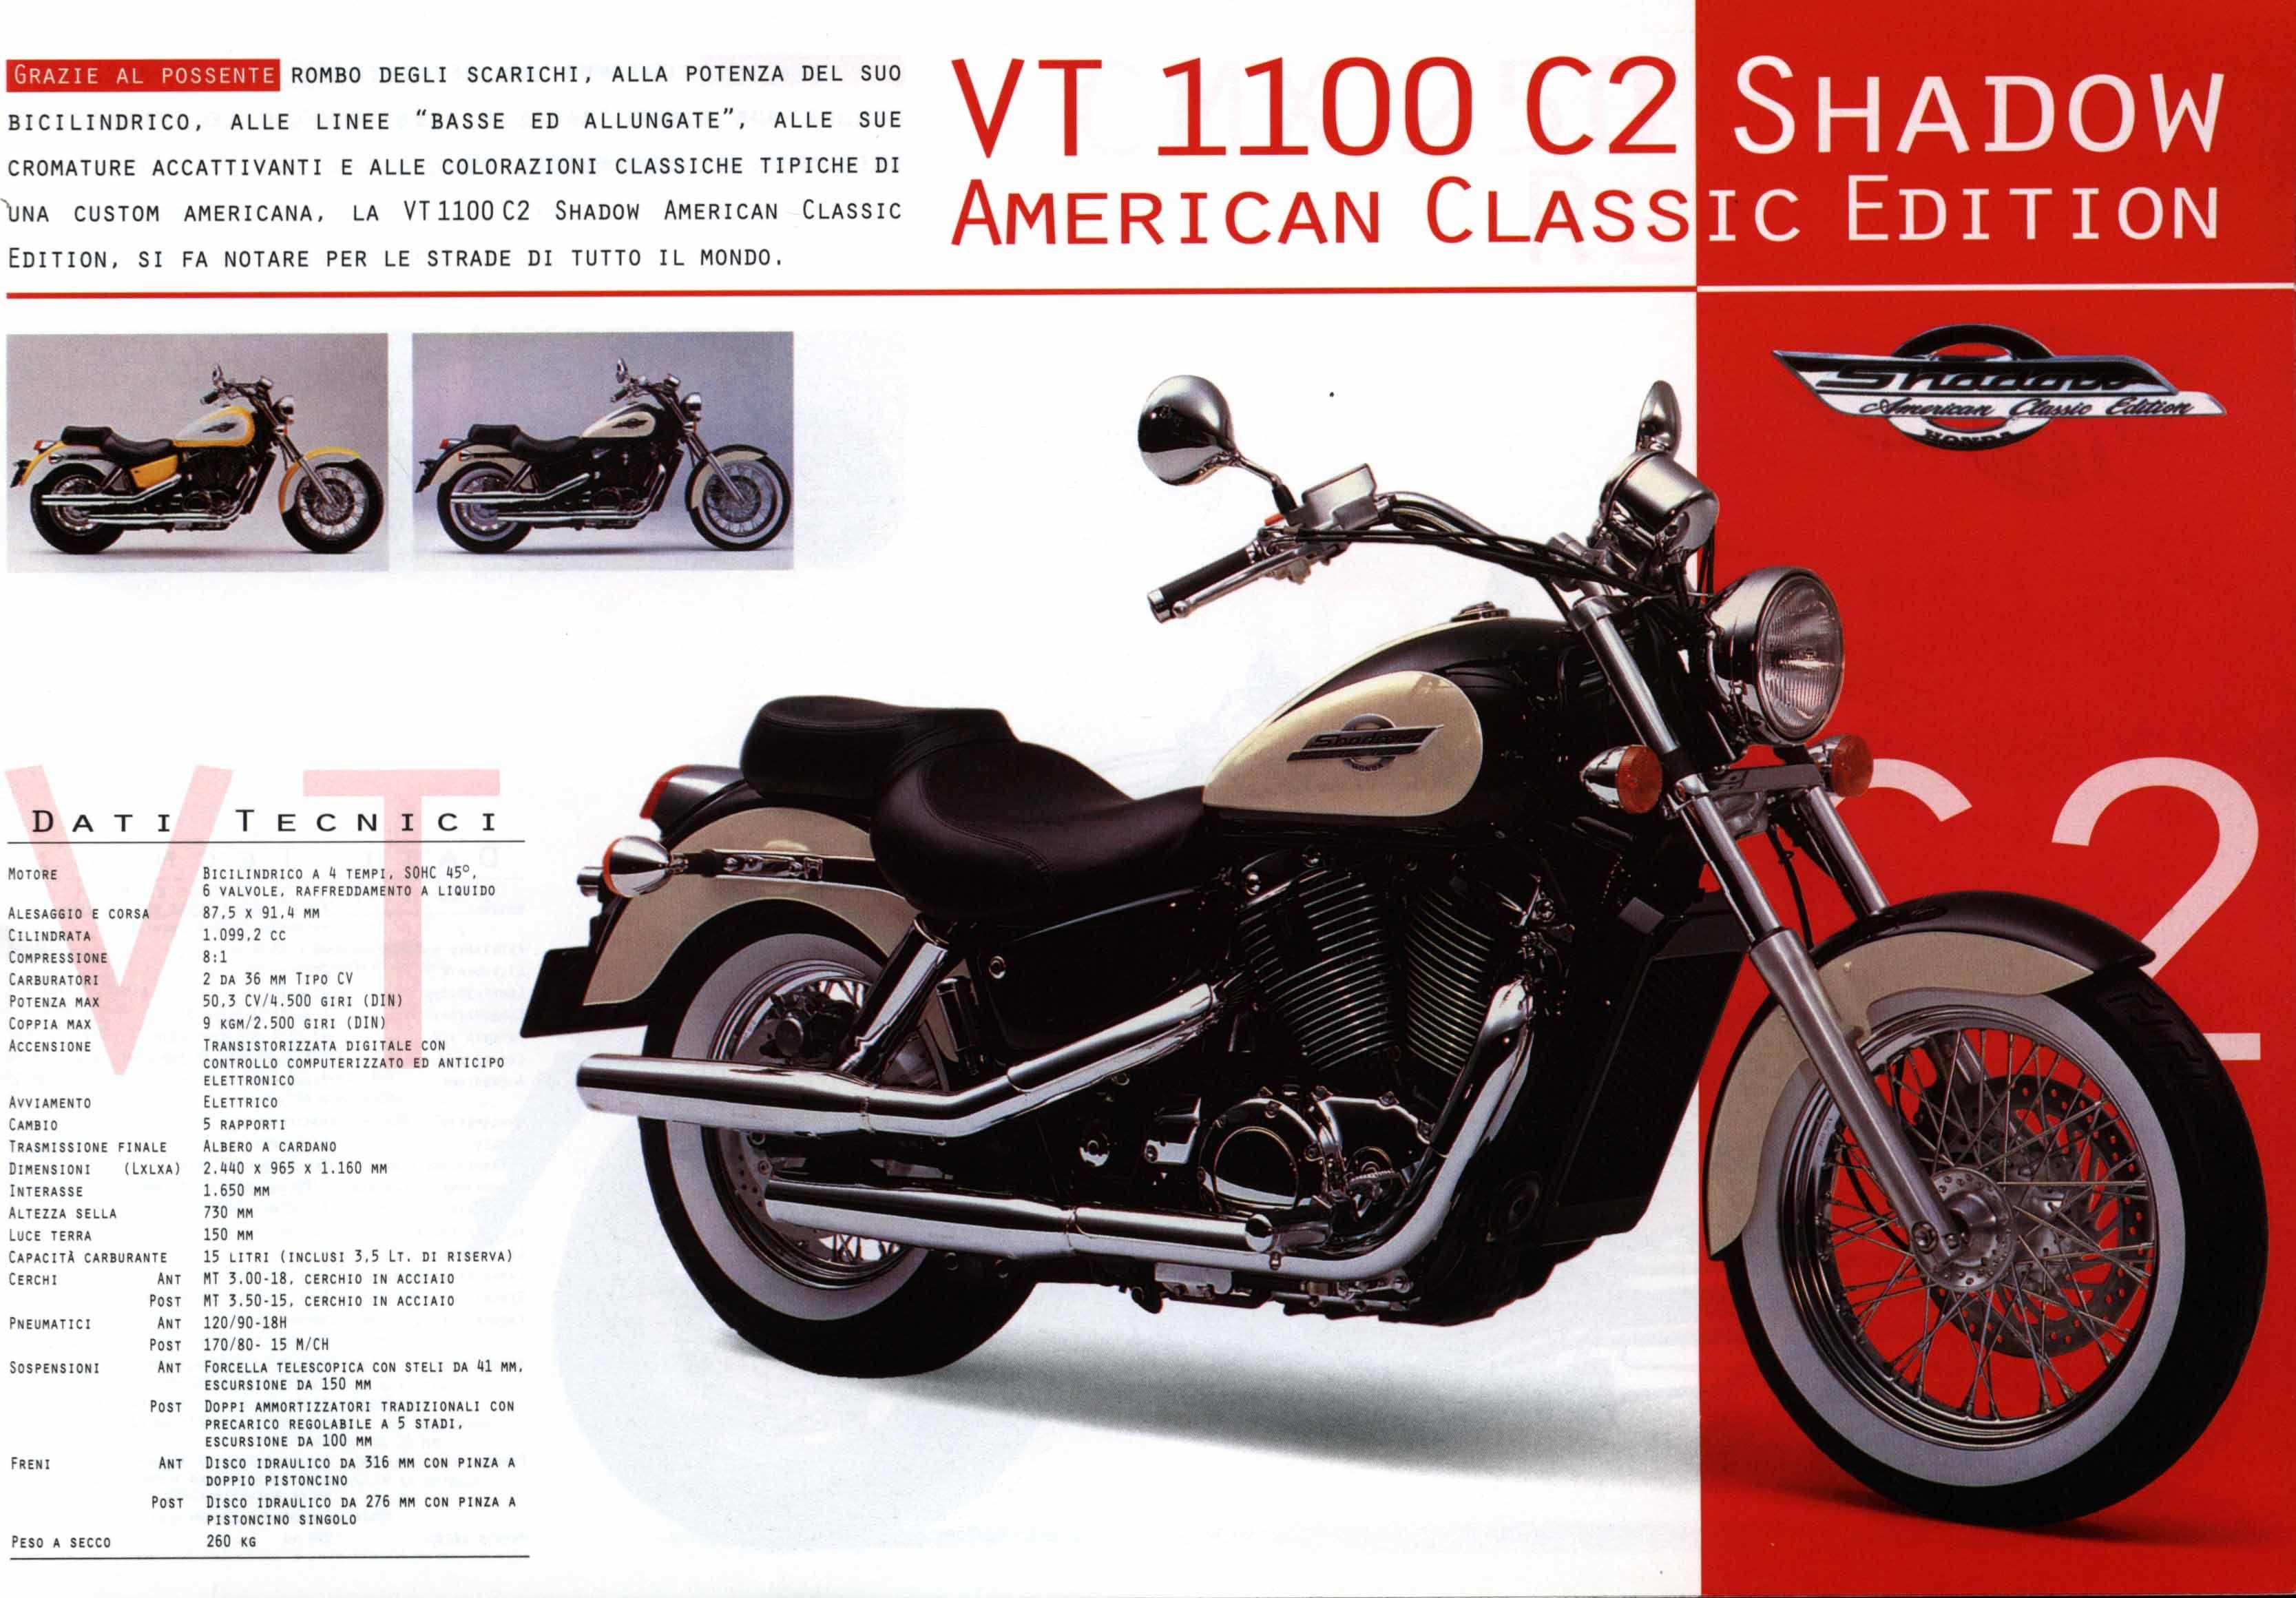 hight resolution of honda vt1100 c2 shadow american classic edition brochure